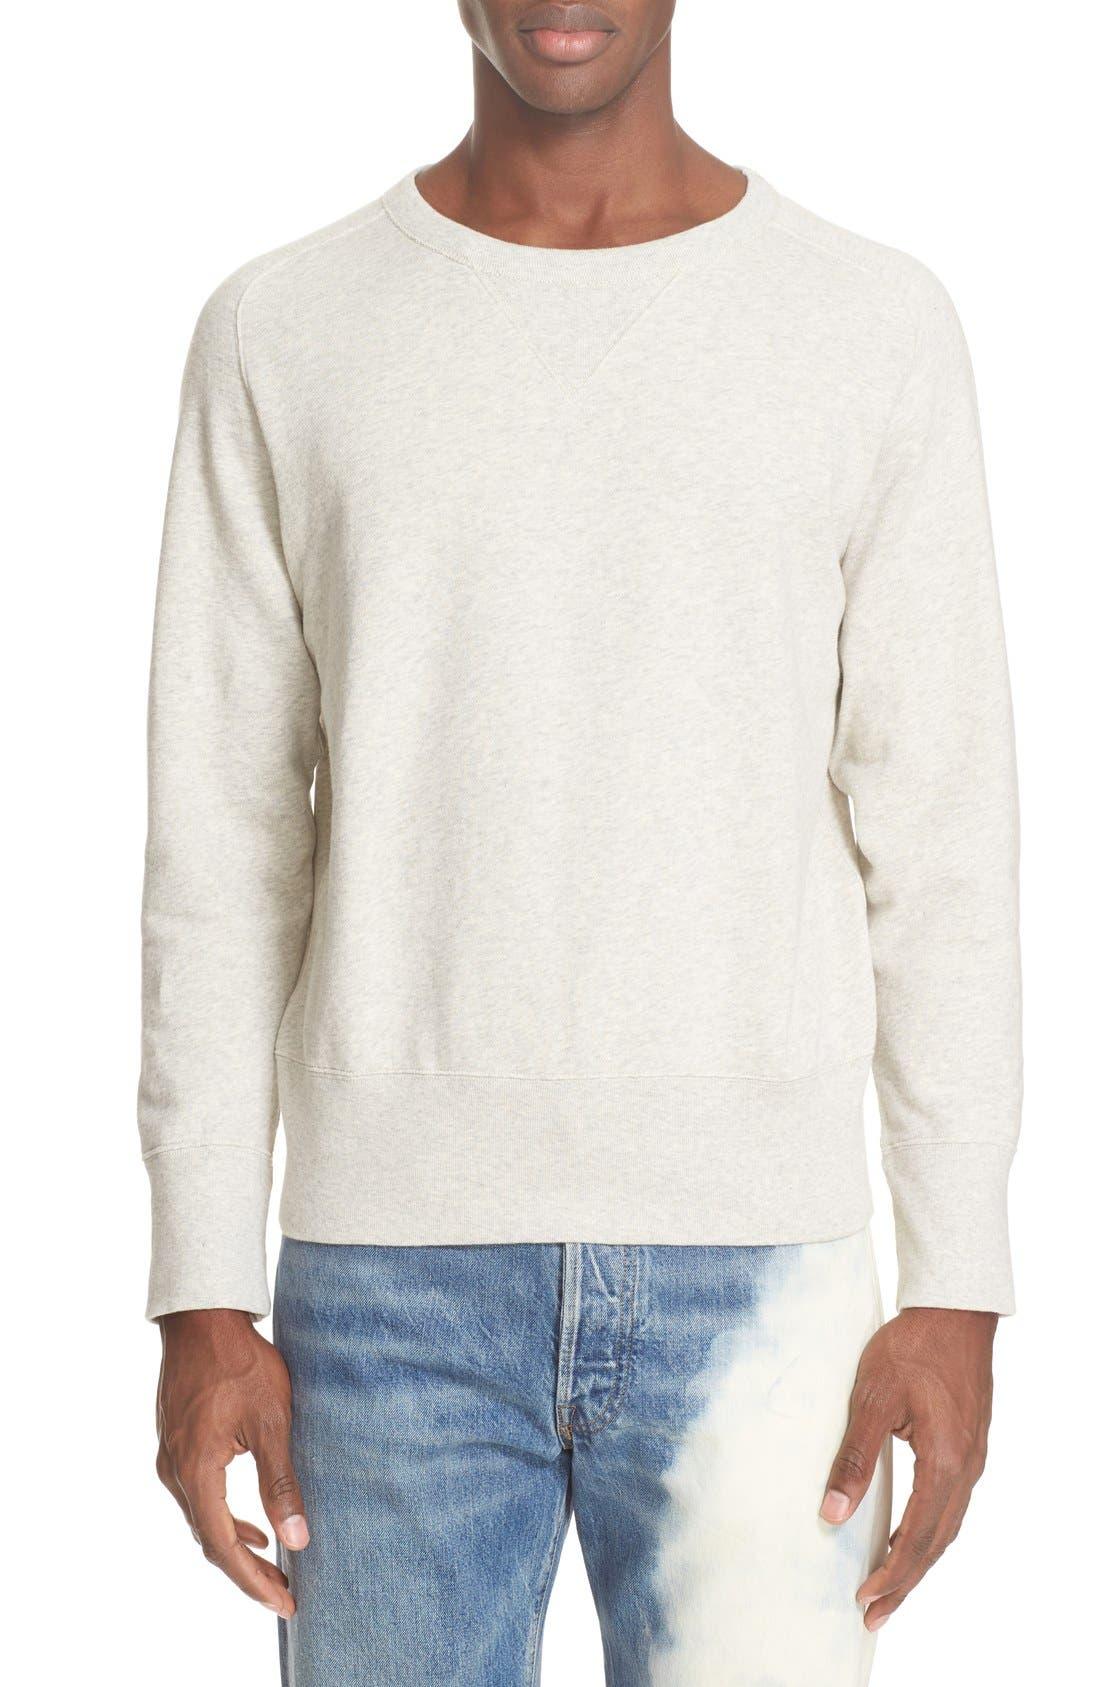 Bay Meadows Sweatshirt,                         Main,                         color, White